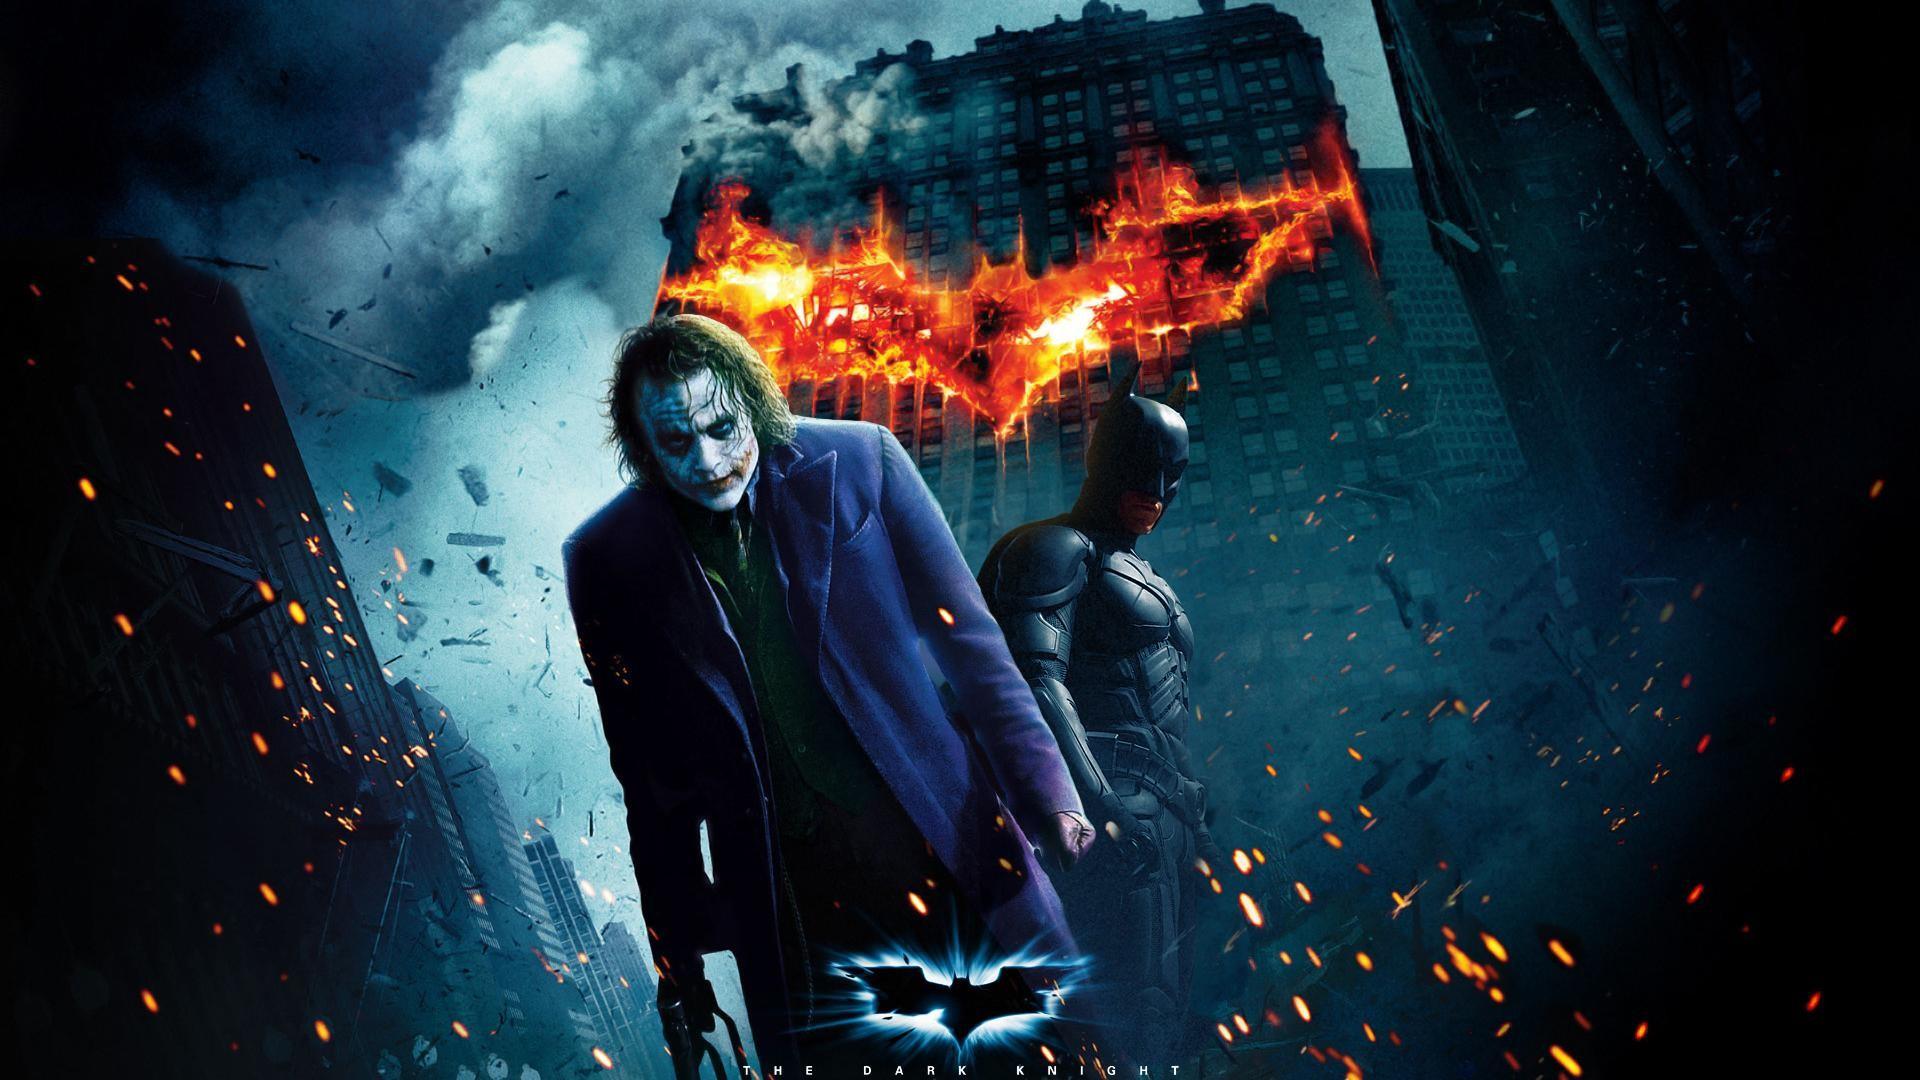 Batman background | Batman wallpapers